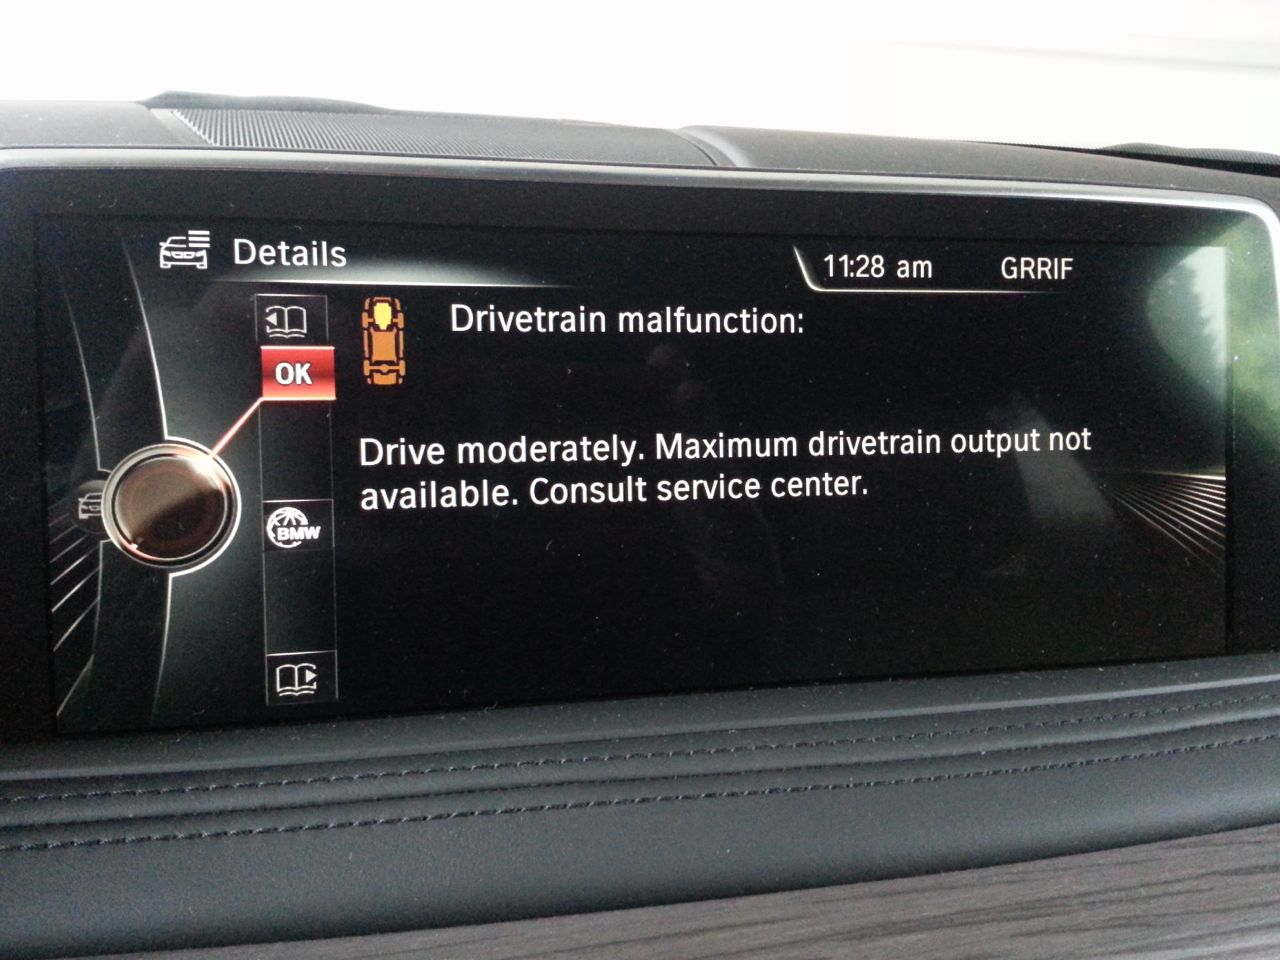 Bmw F30 Drivetrain Malfunction